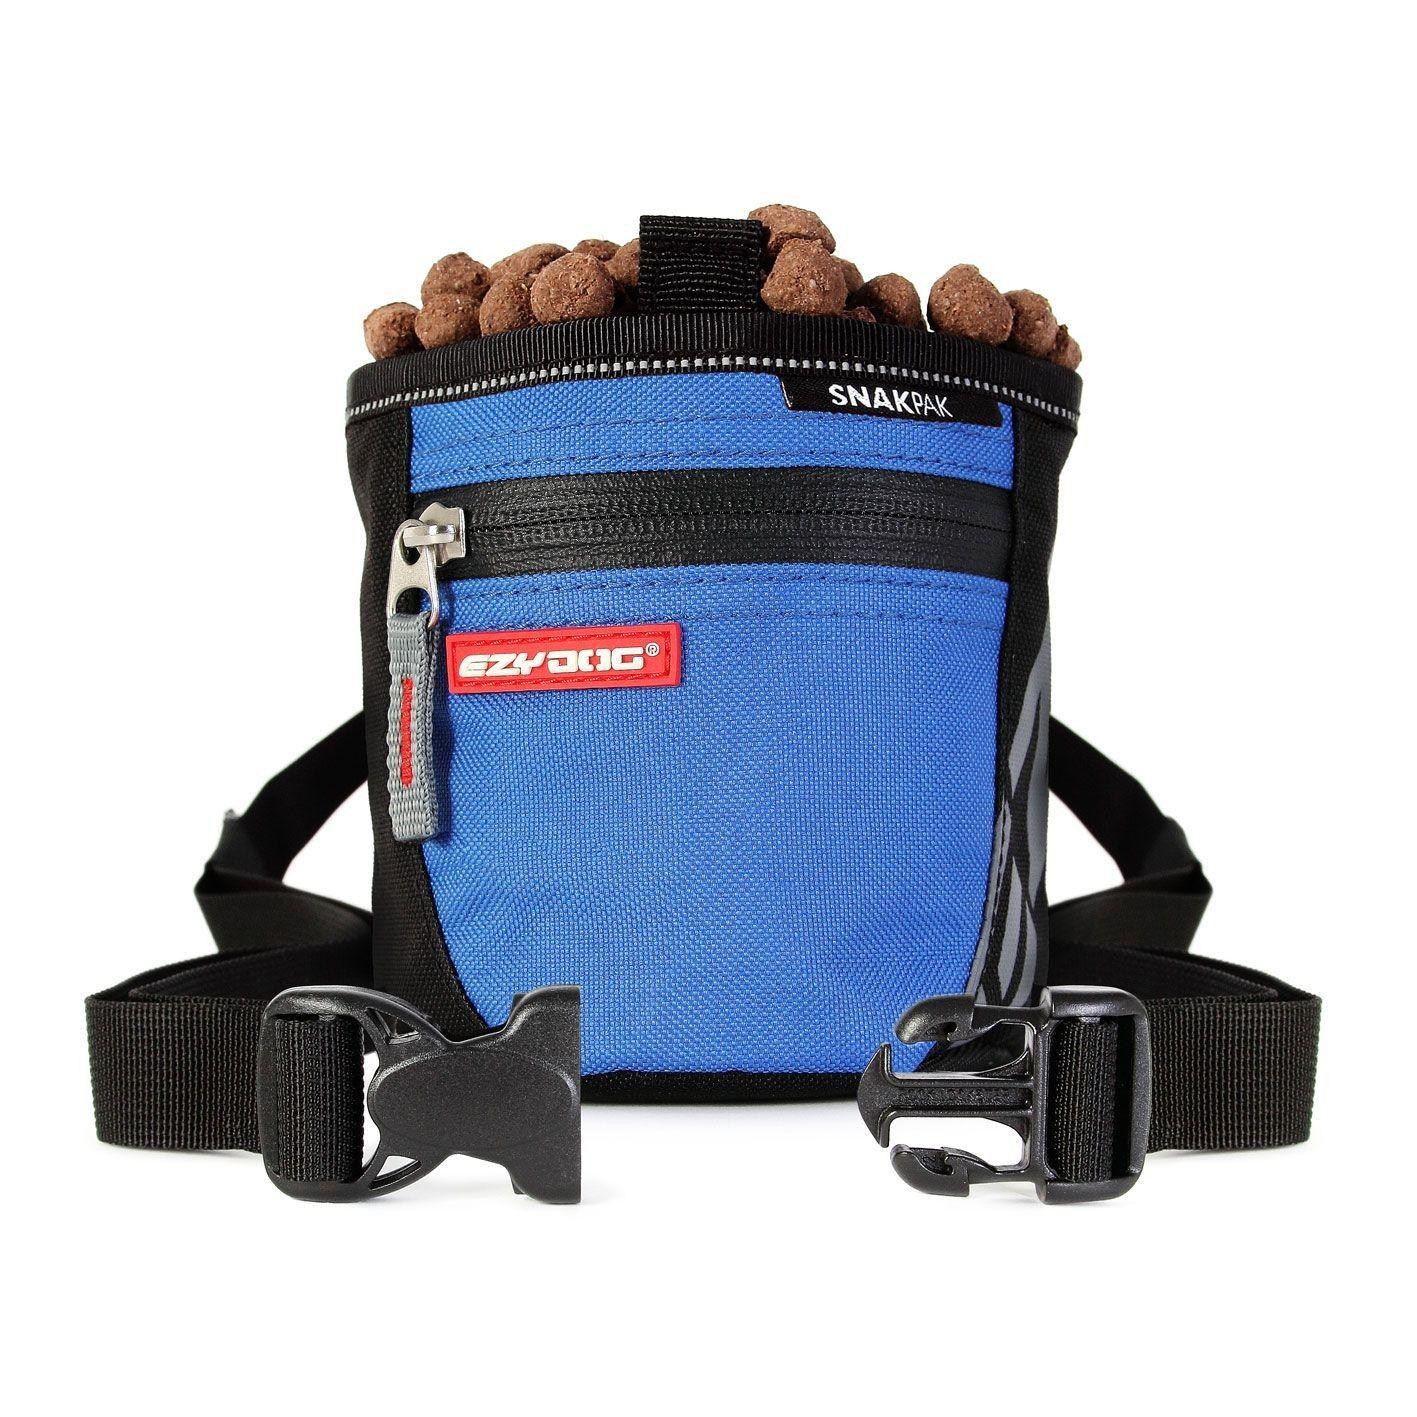 SnakPak Treat Bag